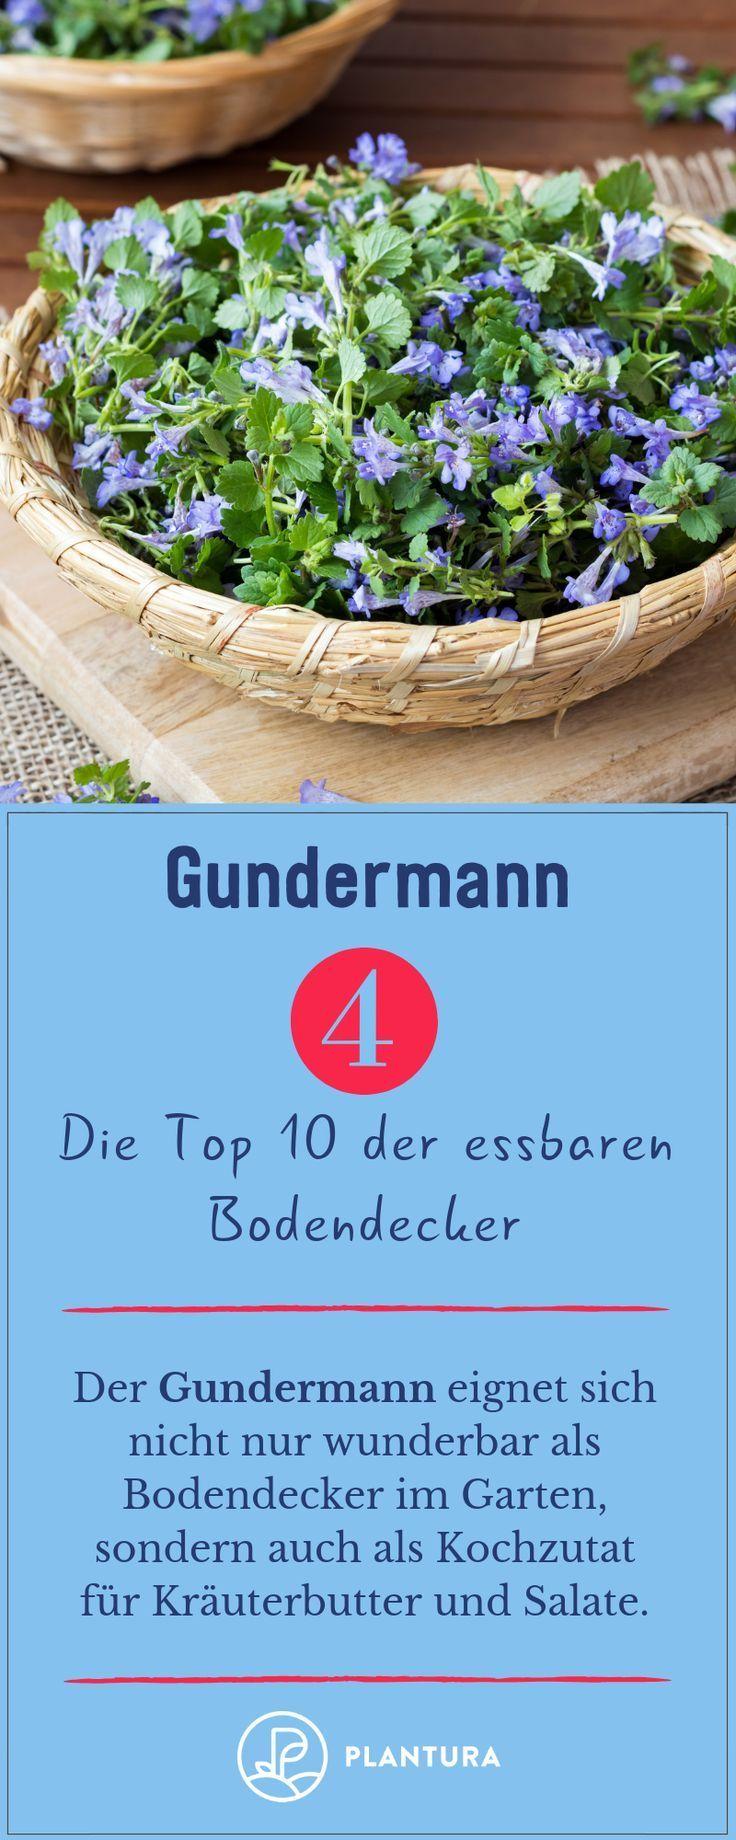 Edible Ground Cover The Top 10 For Your Garden Gartenkuche Rezepte Kuchentipps Container Gardening Vegetables Ground Cover Edible Garden